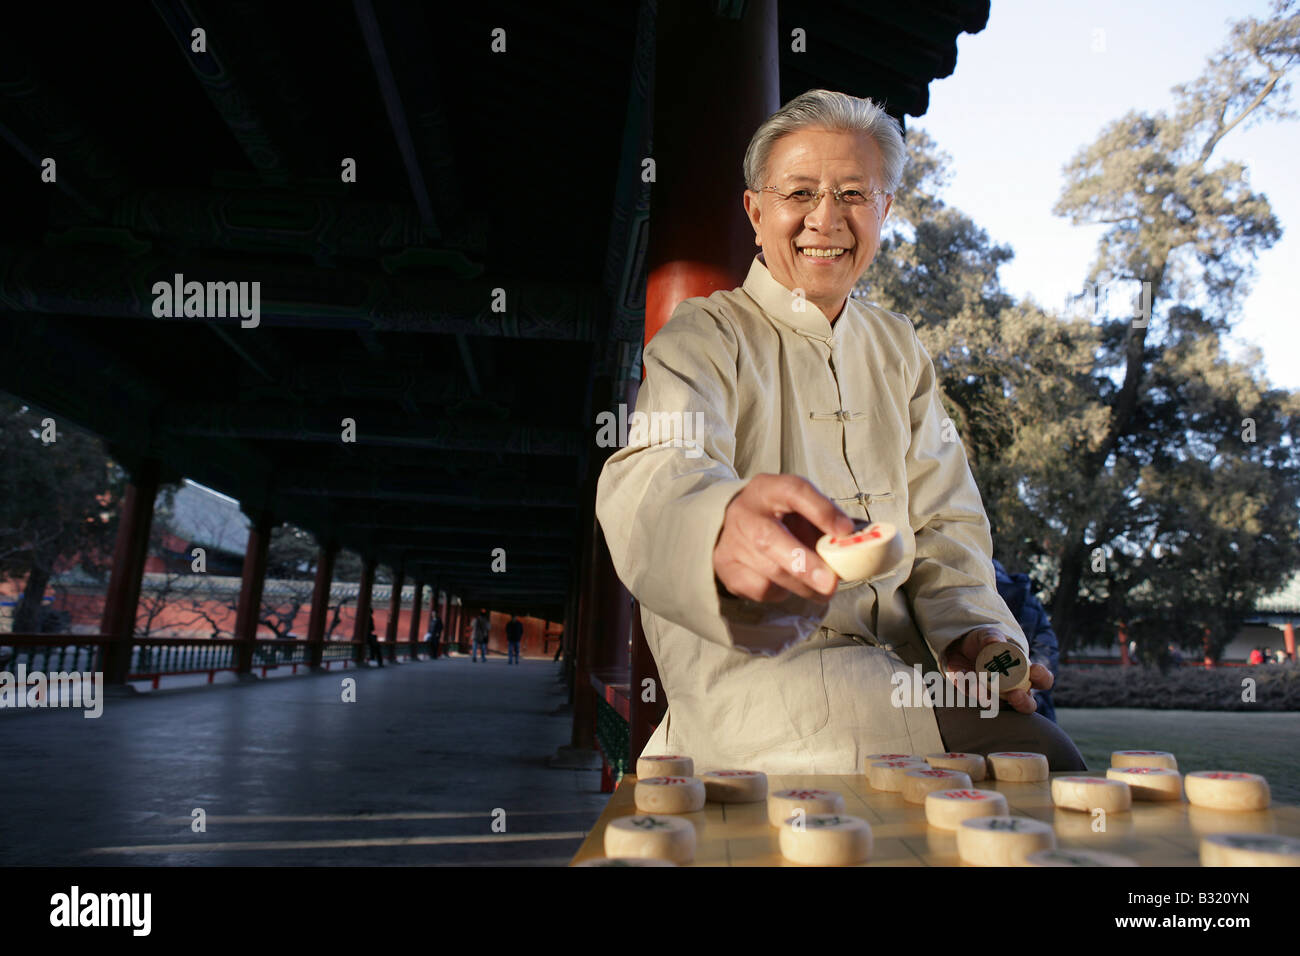 Chinese Senior Adult Playing Chess - Stock Image